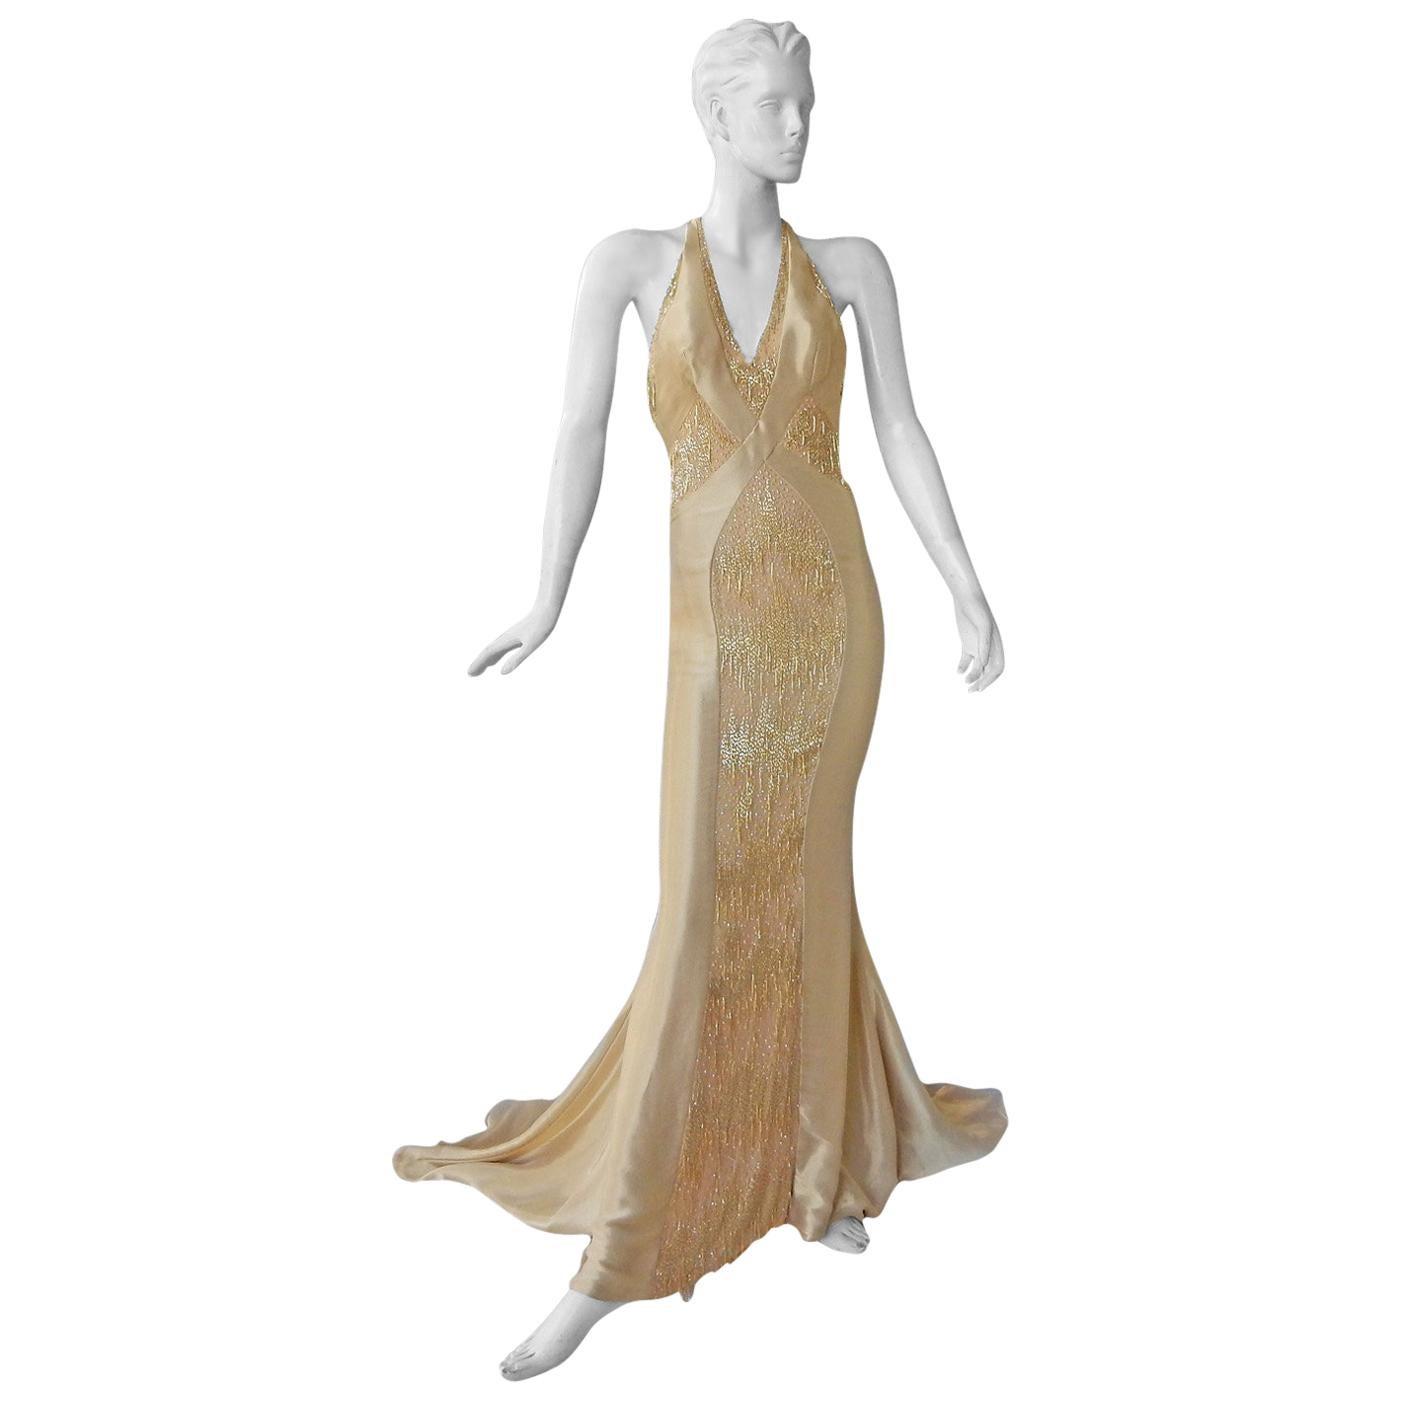 Atelier Versace Golden Waterfall Swan Tail Dress Gown